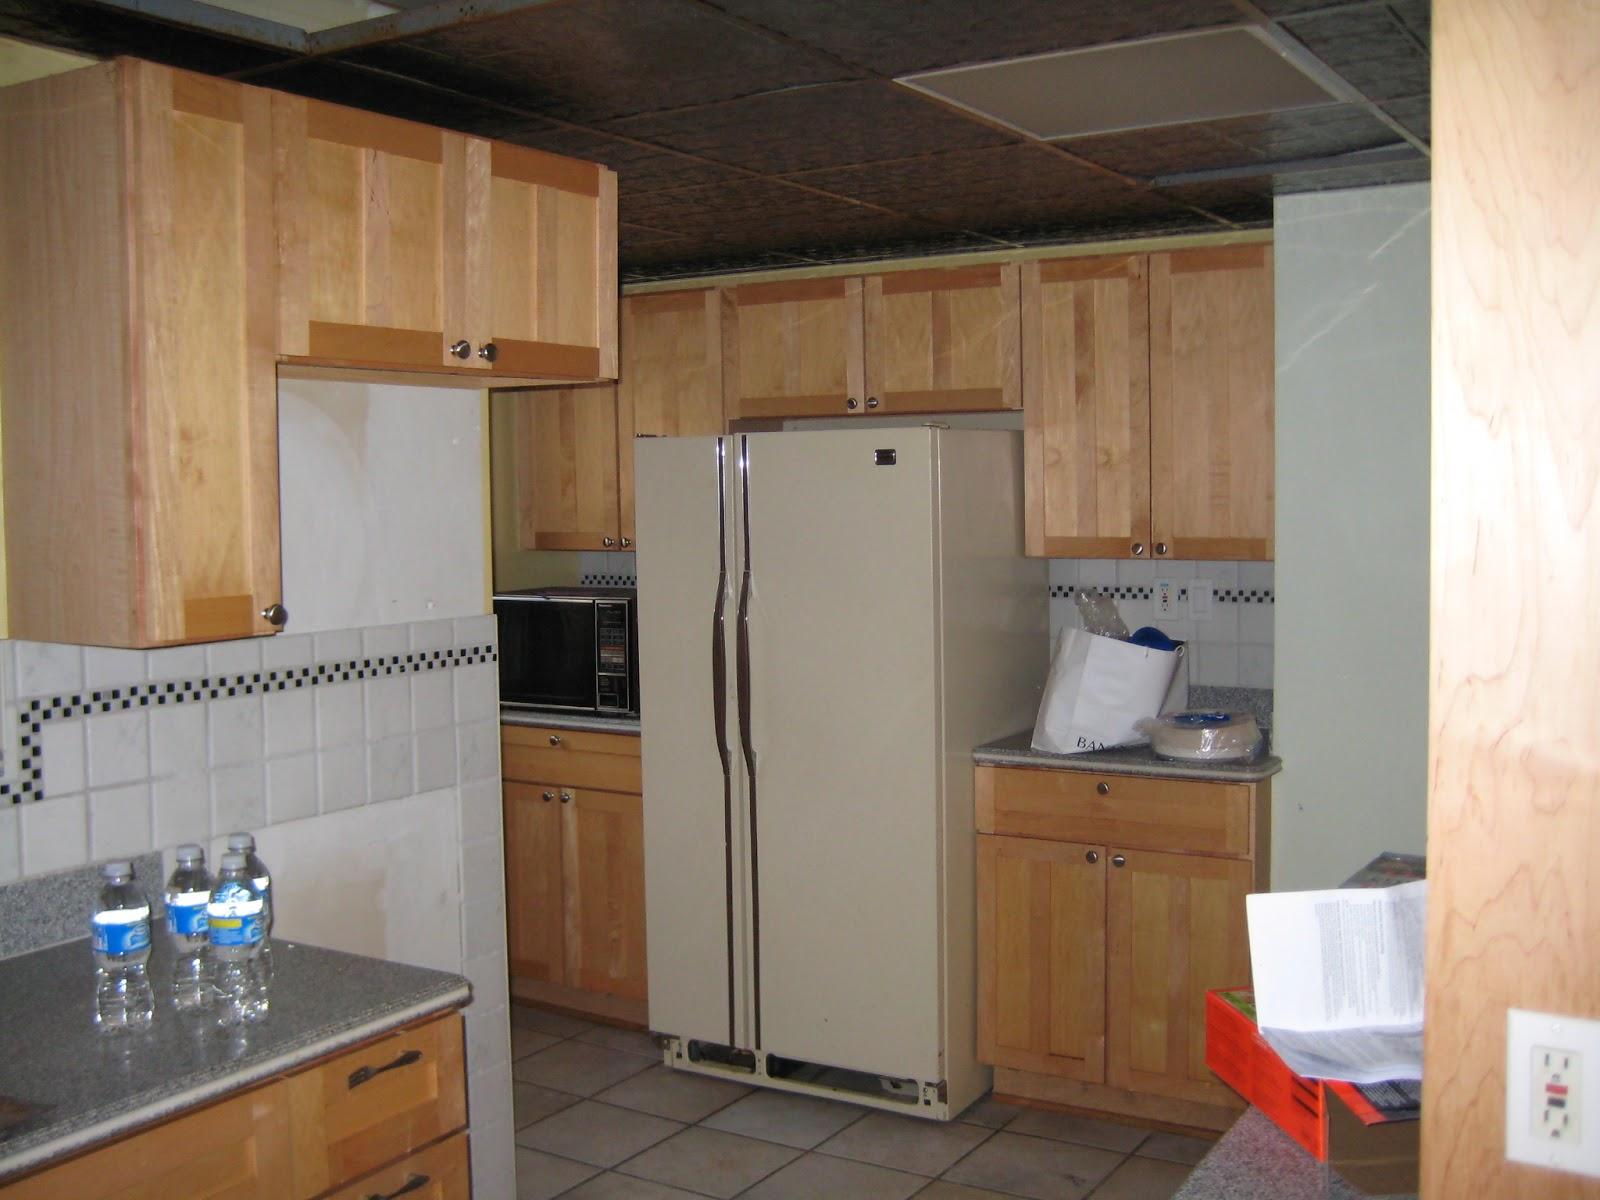 Kitchen Remodeling Birmingham Mi Sheer Curtains Prestige Construction